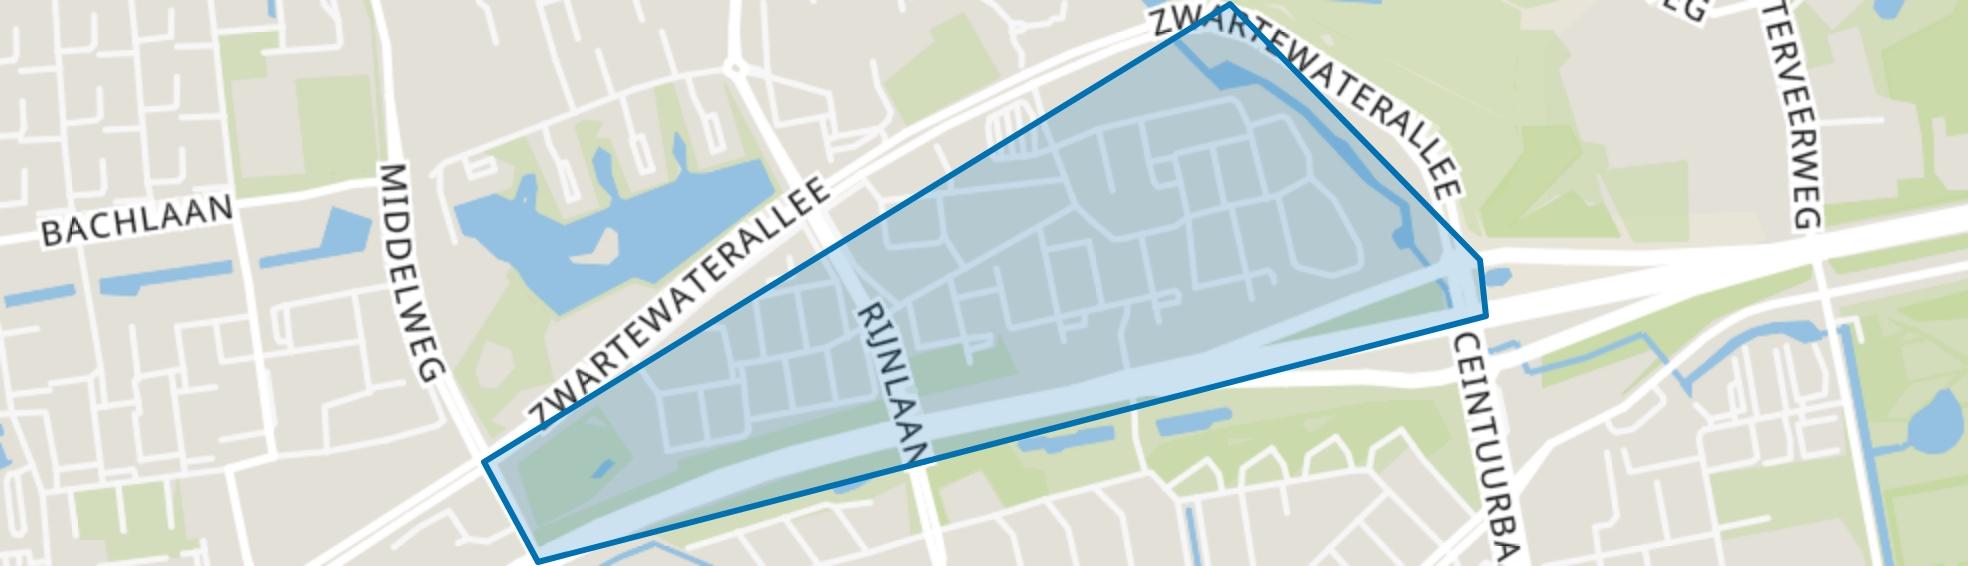 Aa-landen-Zuid, Zwolle map